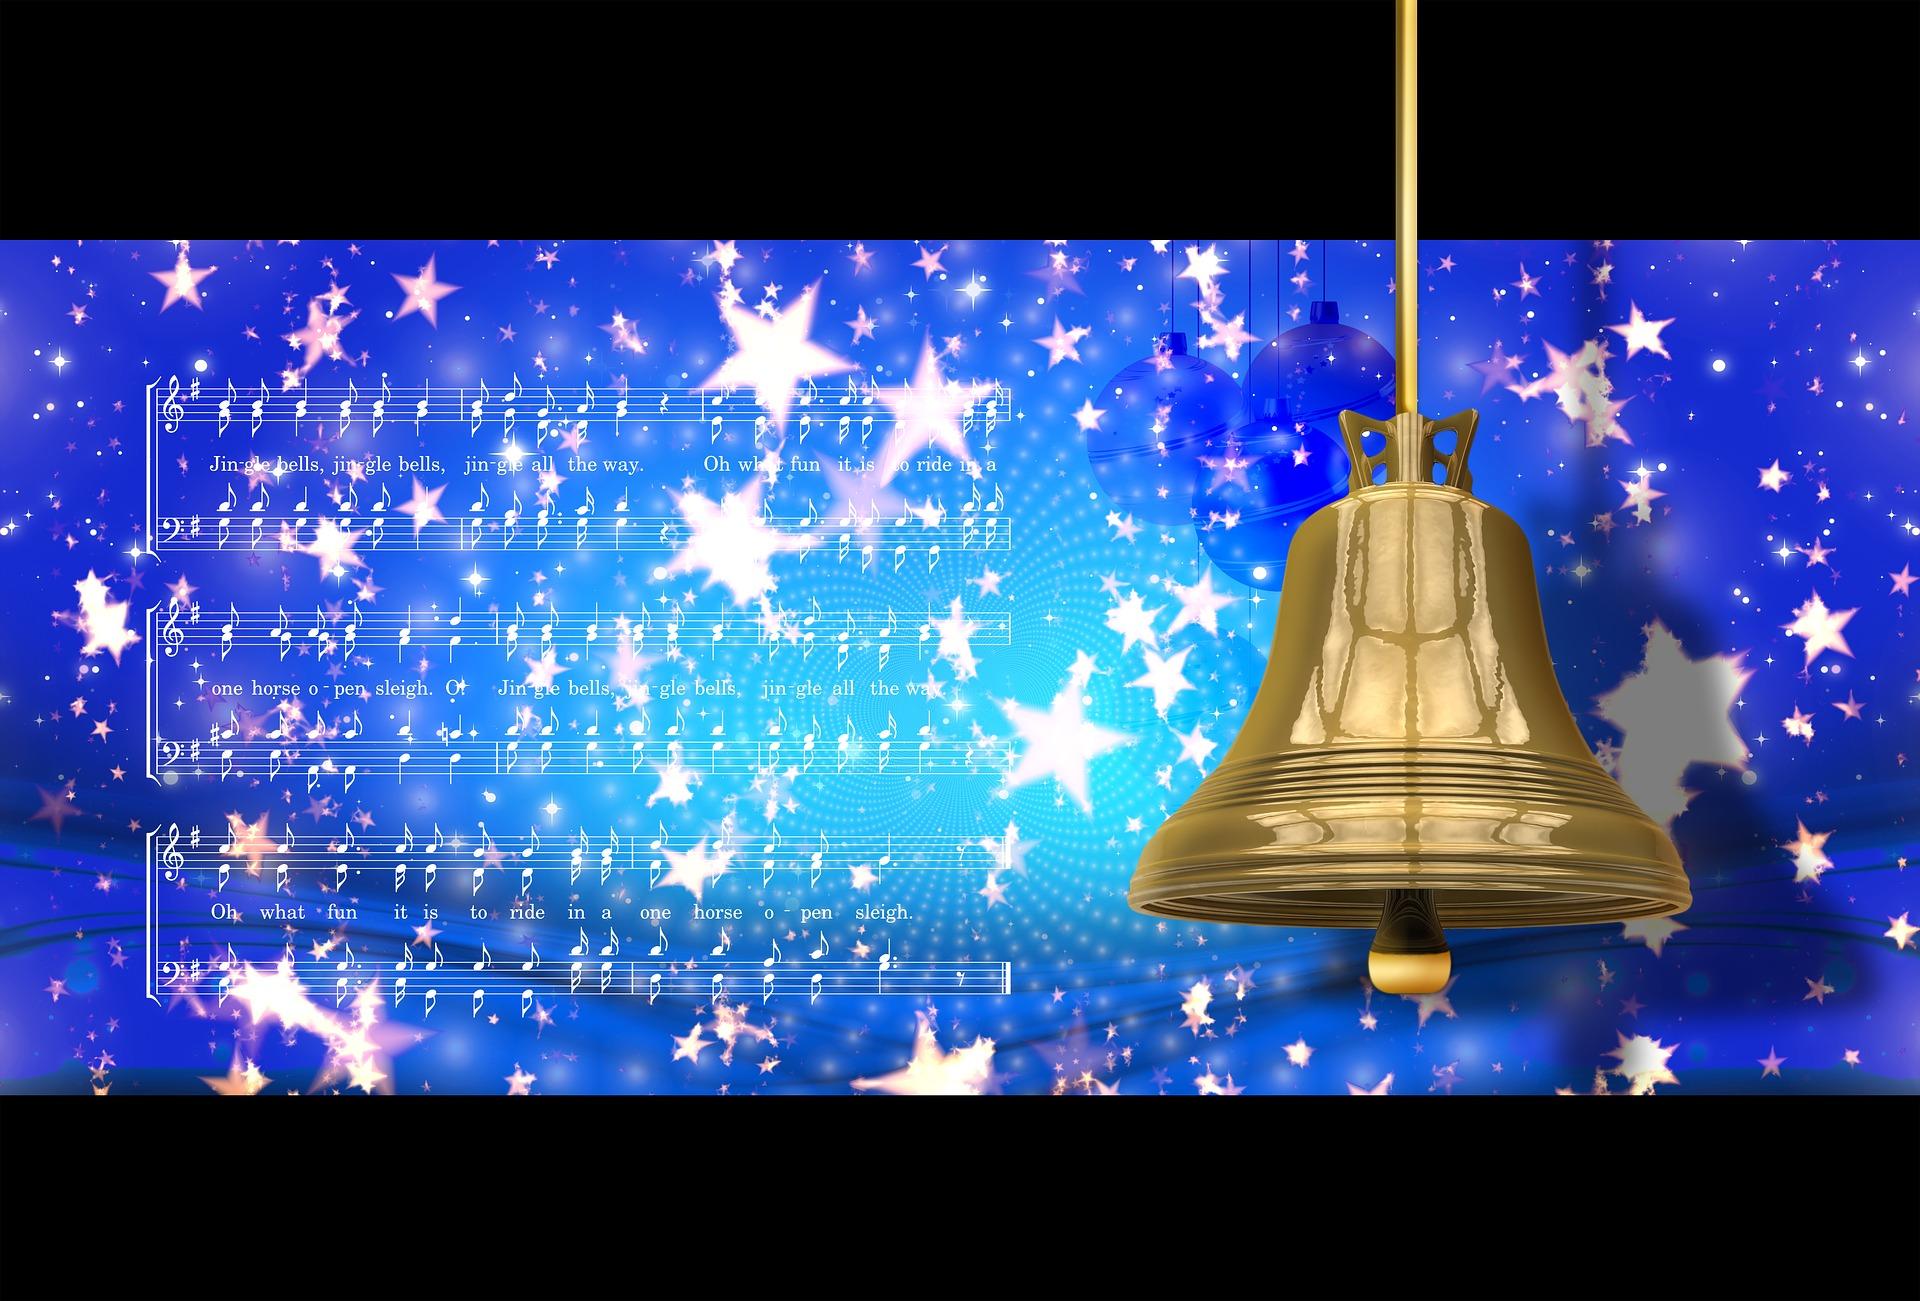 C3 Christmas Carols - 2020 Christmas Events for the Family